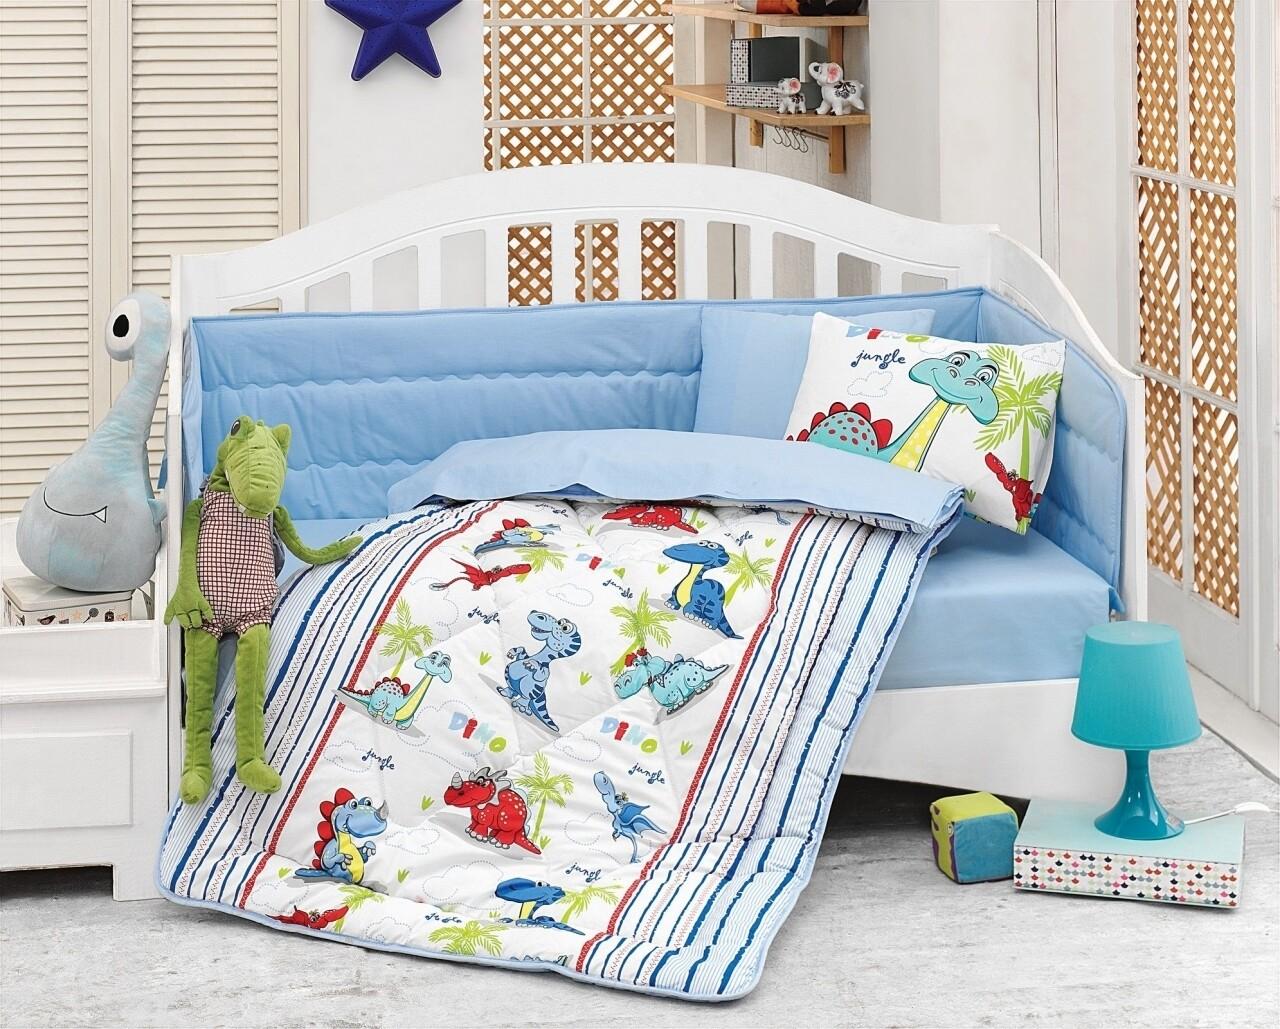 Set de pat pentru copii, 6 piese, 100% bumbac ranforce, Cotton Box, Dino